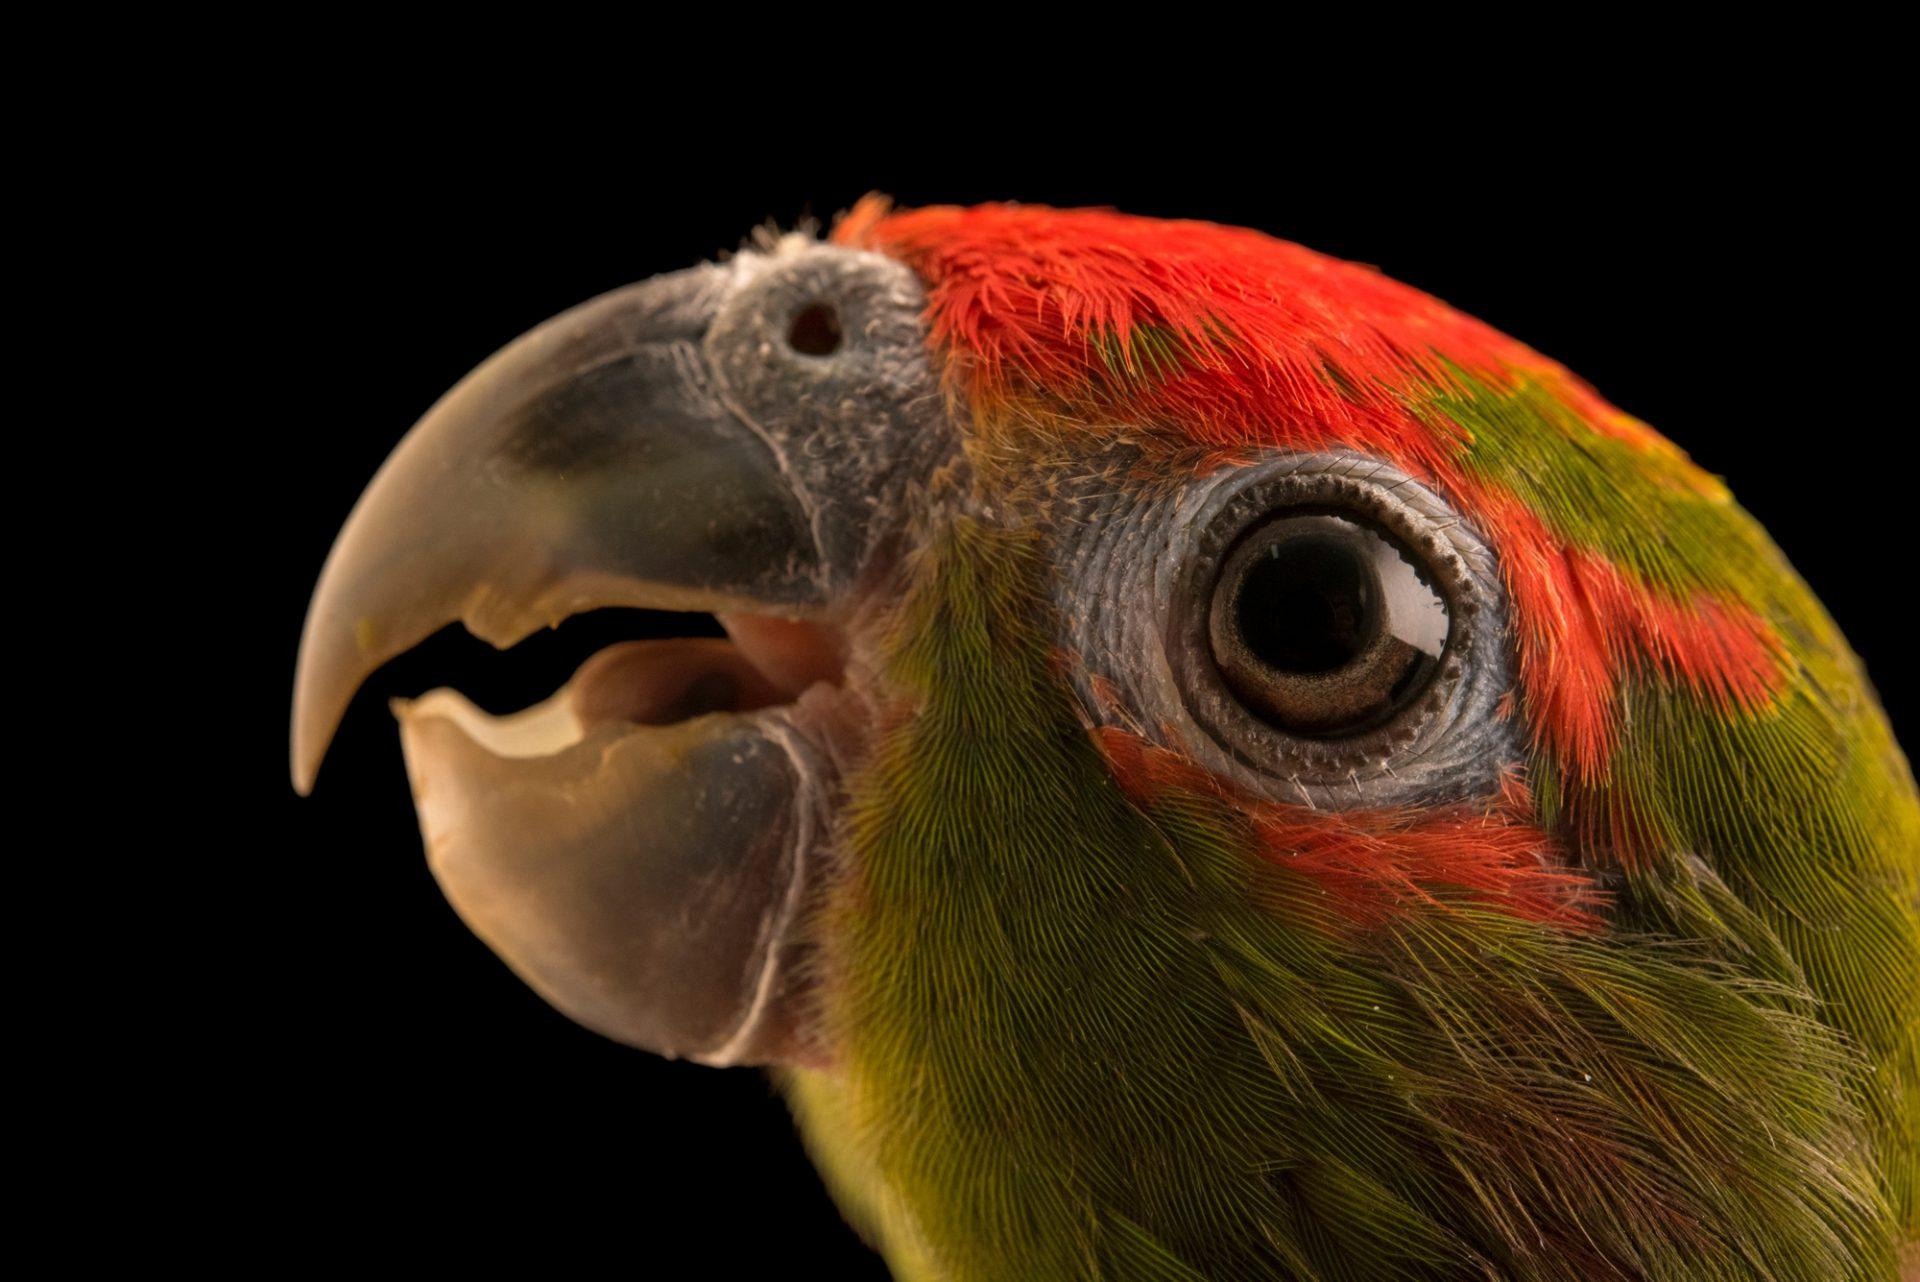 Photo: A male pileated parrot, Pionopsitta pileata, at Loro Parque Fundacion.